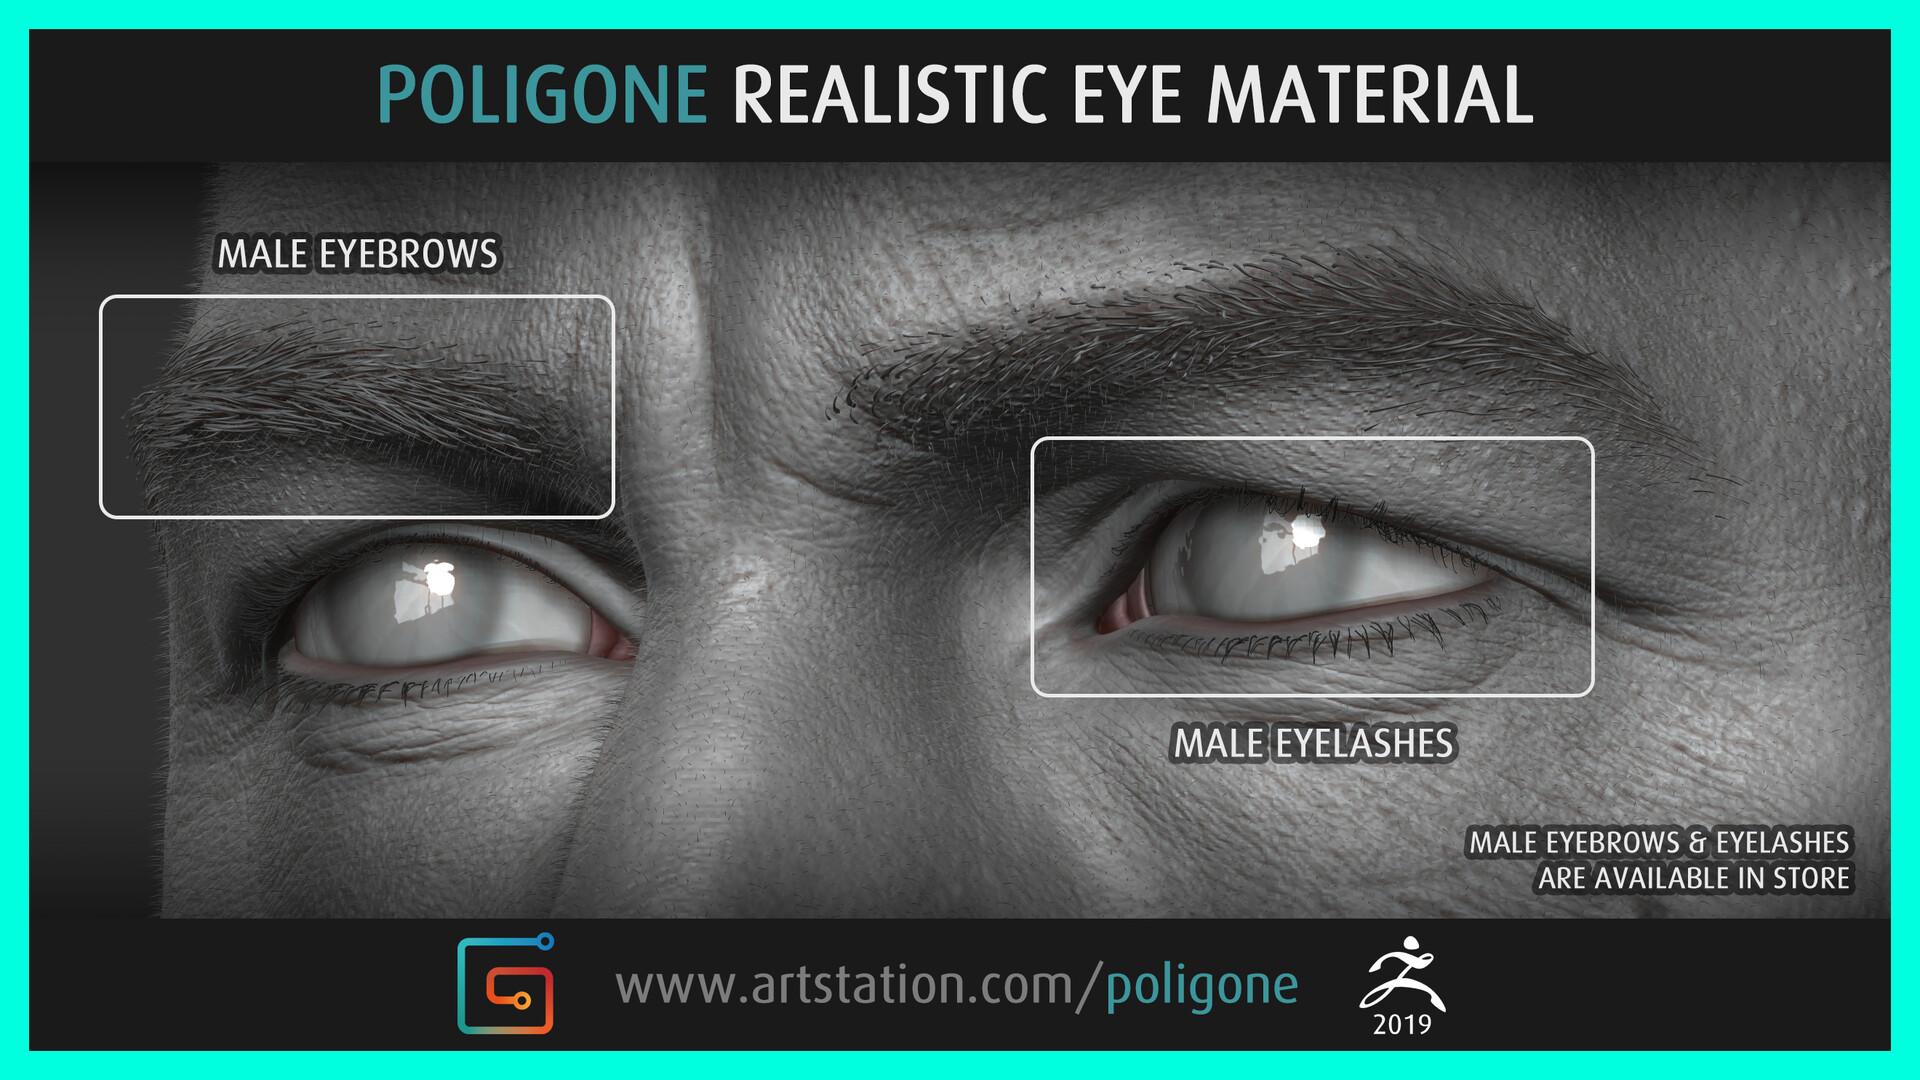 Poligone cg 4